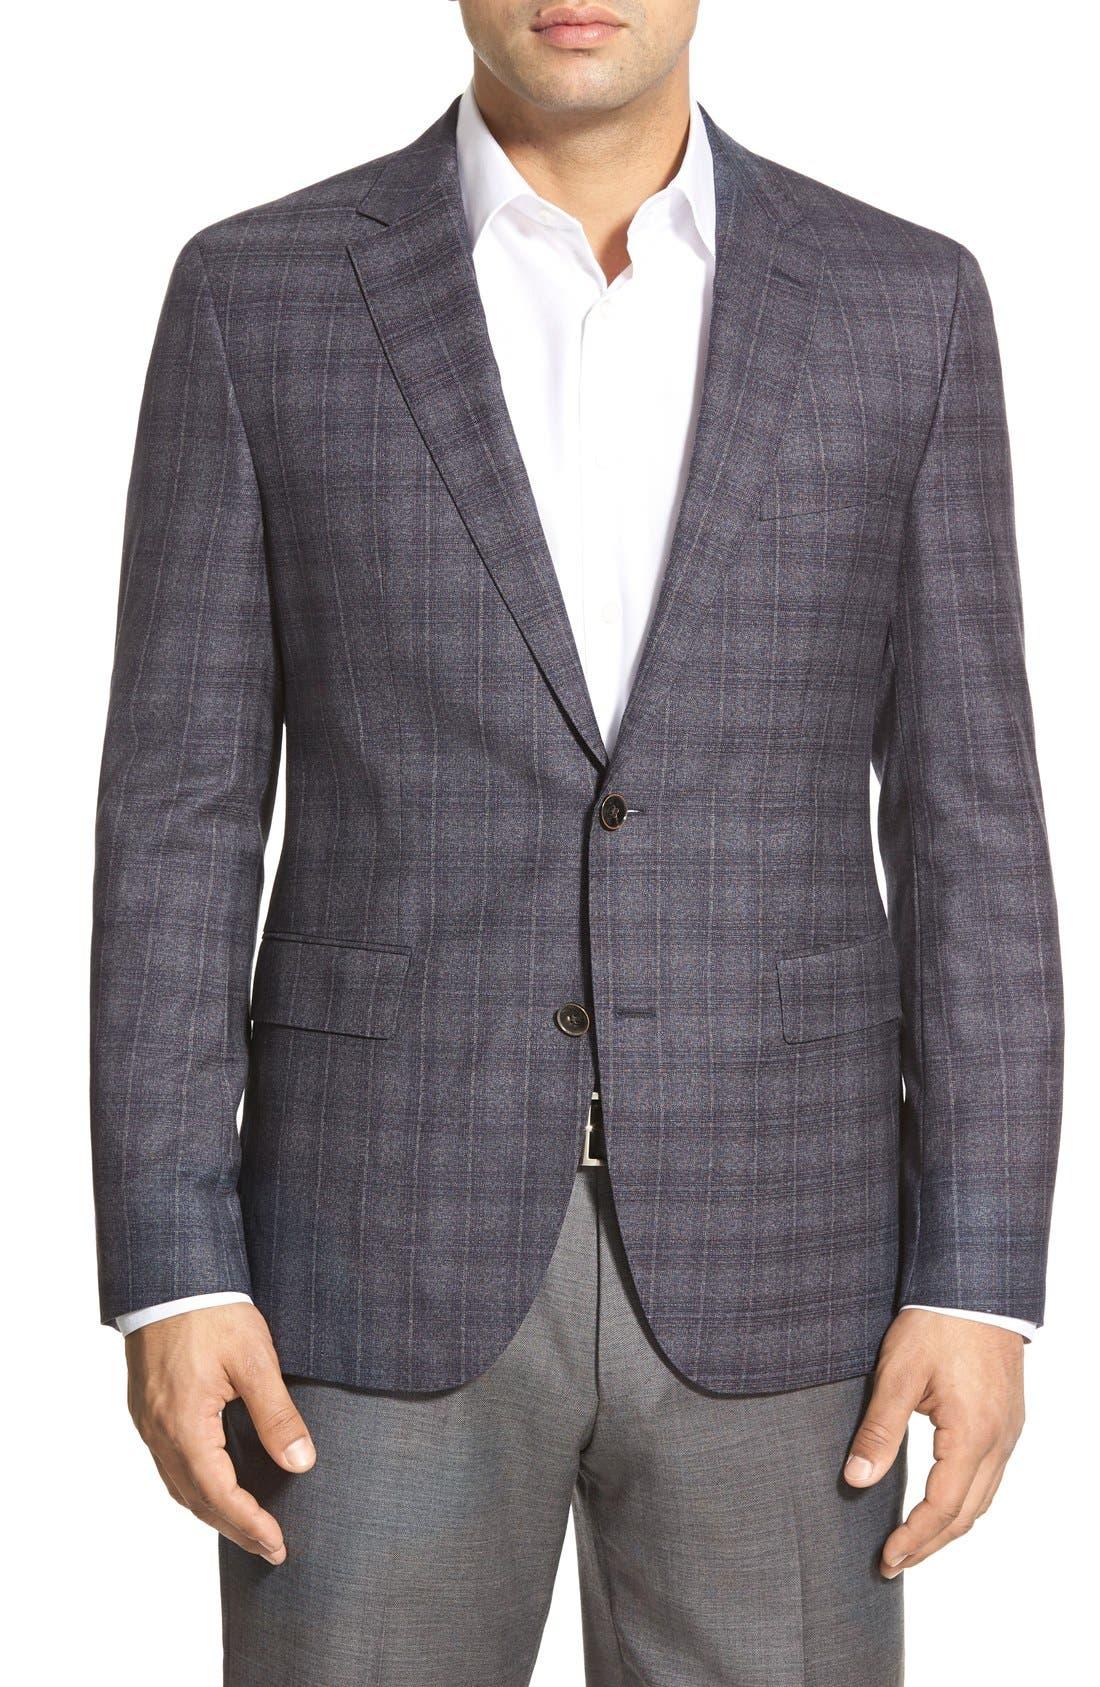 ZZDNUHUGO BOSS, BOSS 'Jayden' Trim Fit Plaid Wool Sport Coat, Main thumbnail 1, color, 420